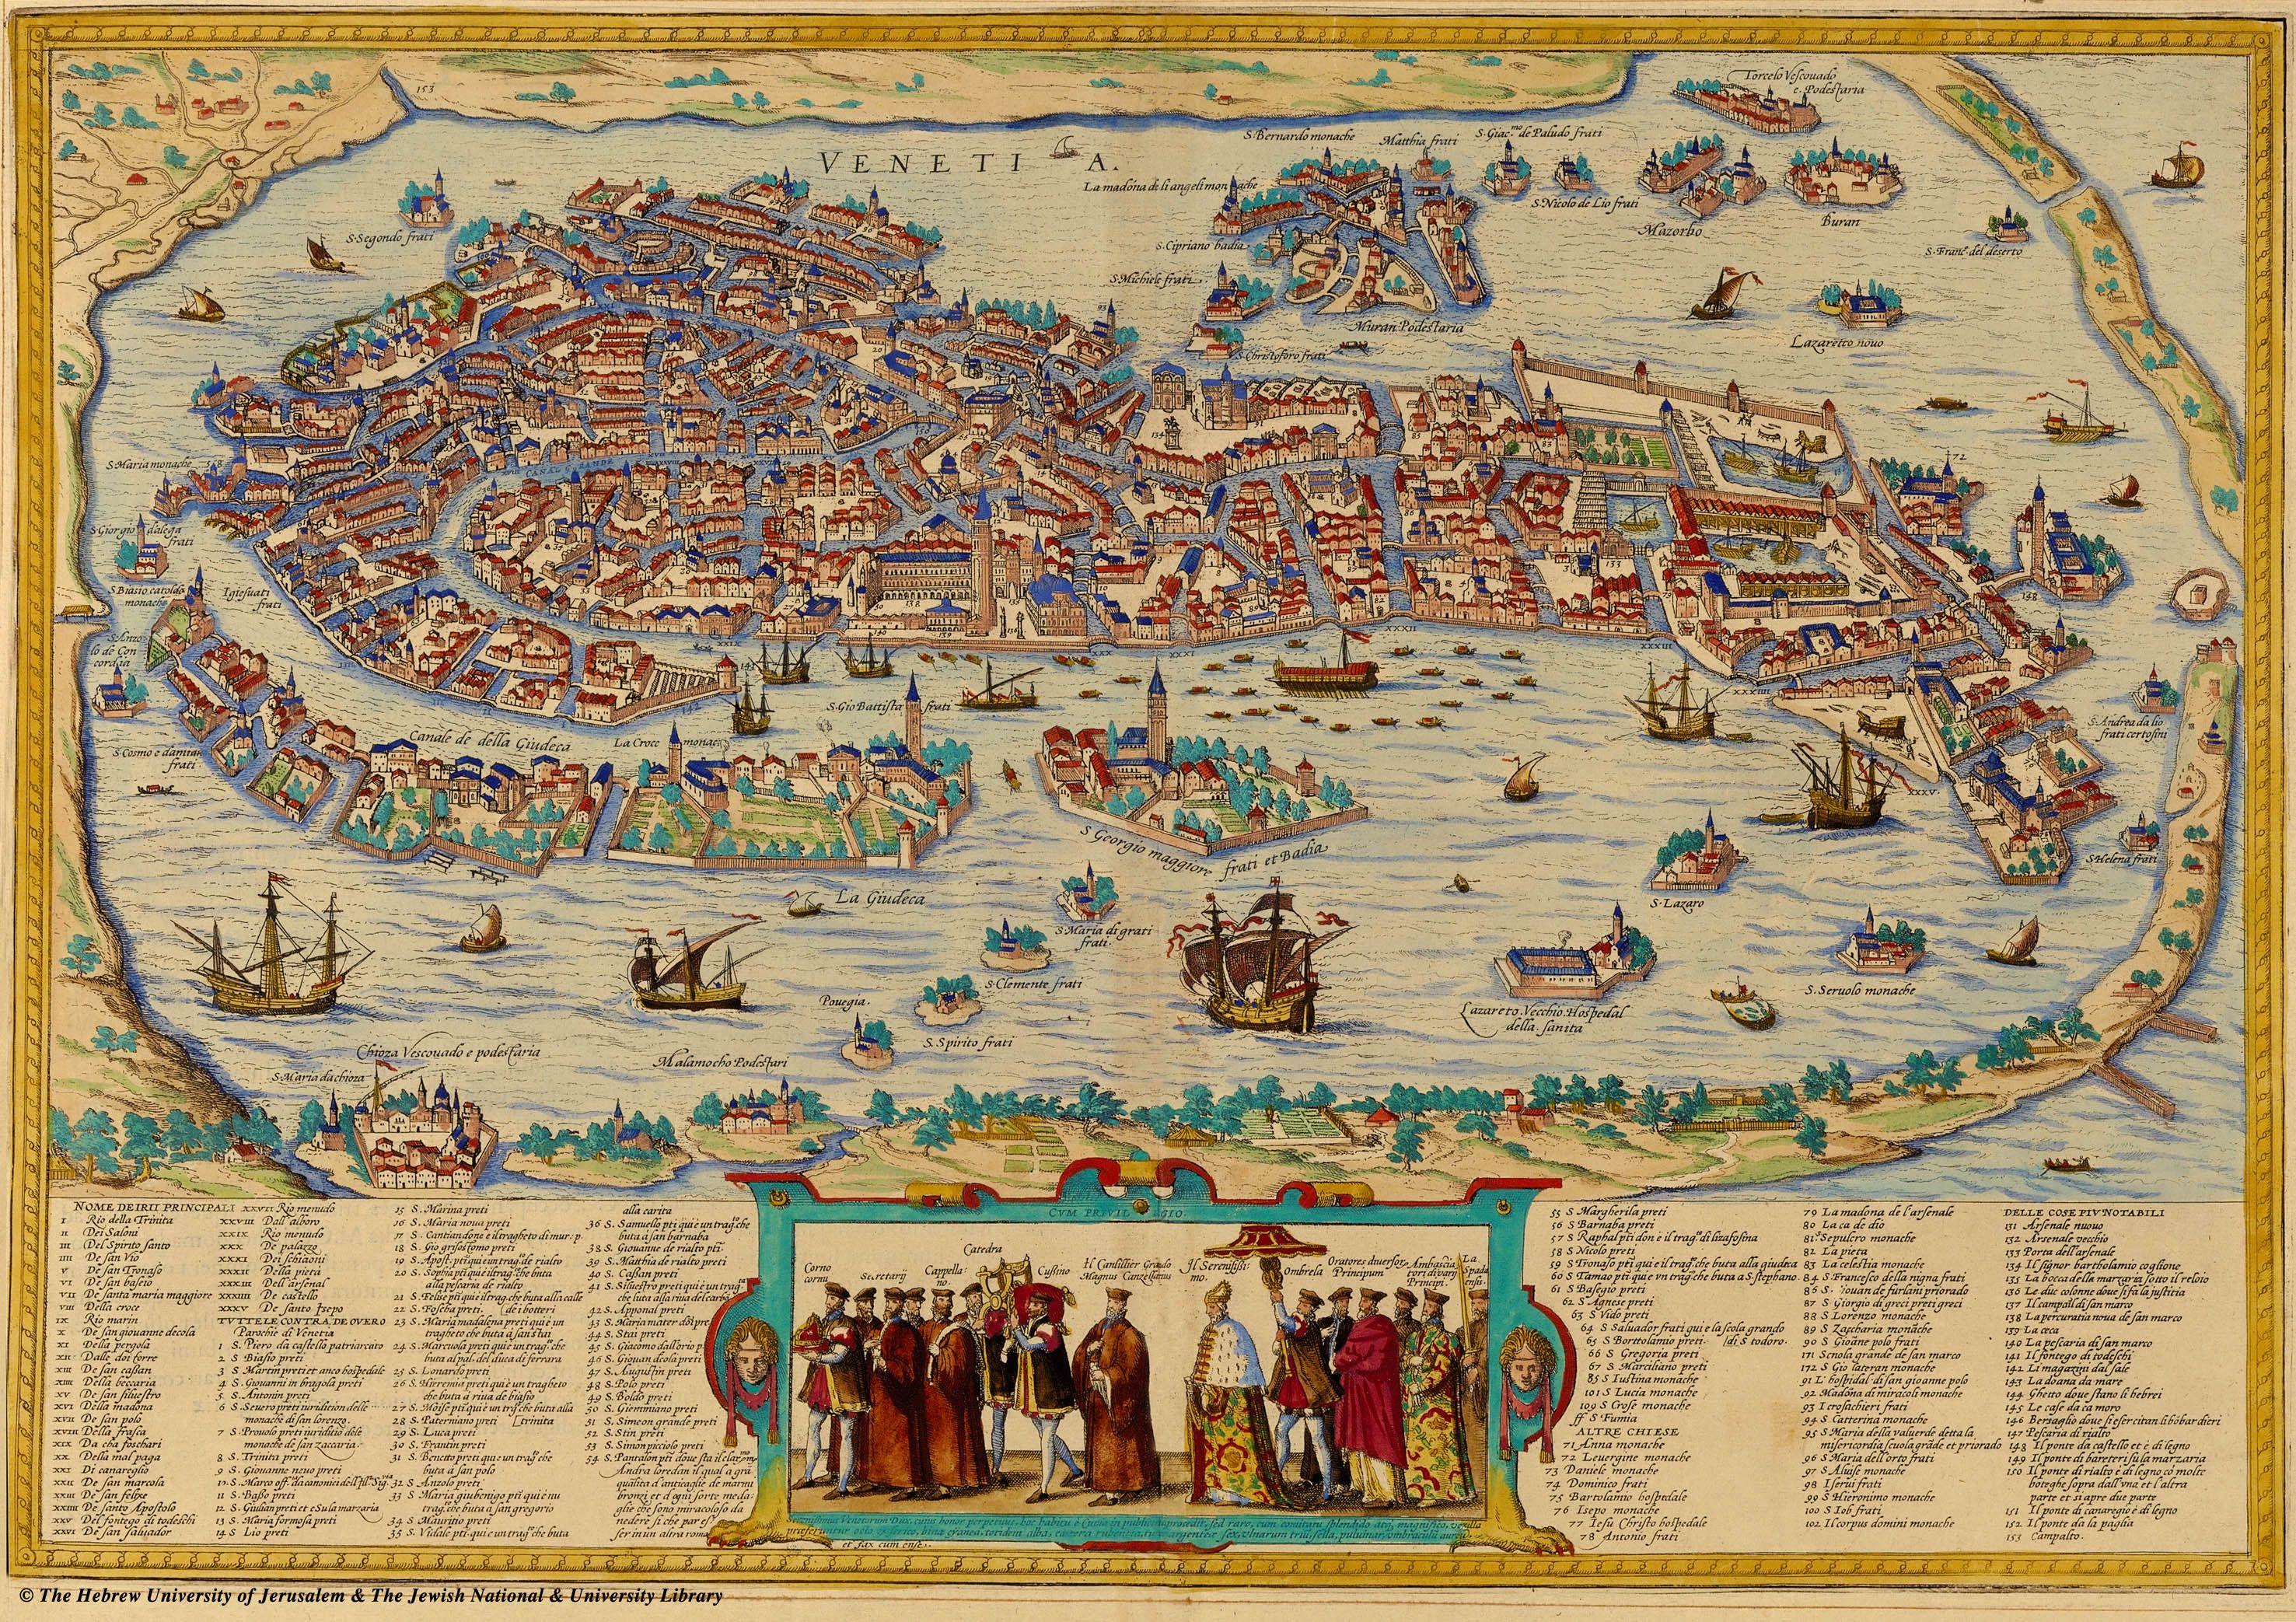 Contemporary Maps Of Renaissance Italian Cities Courtesy Of The - Venice city map